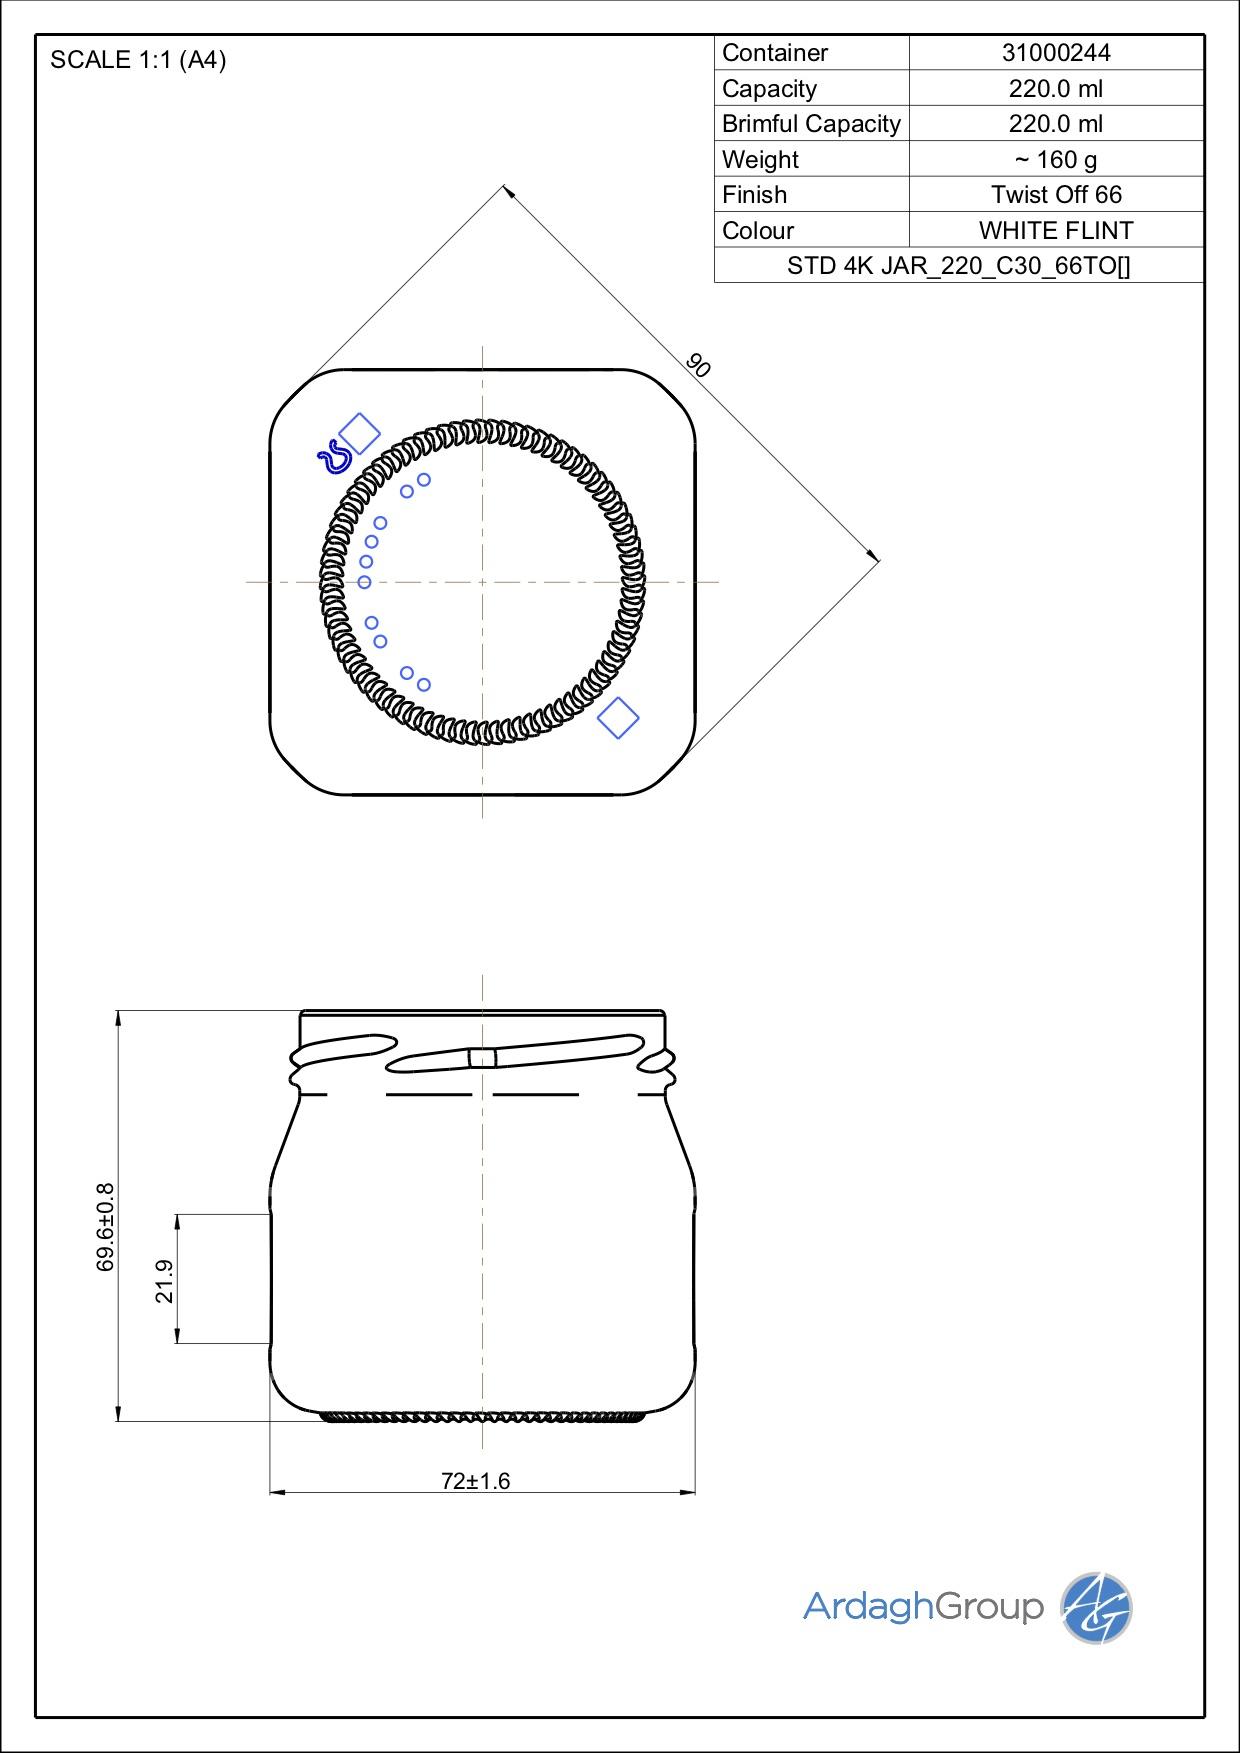 STD 4K JAR 220 C30 66TO